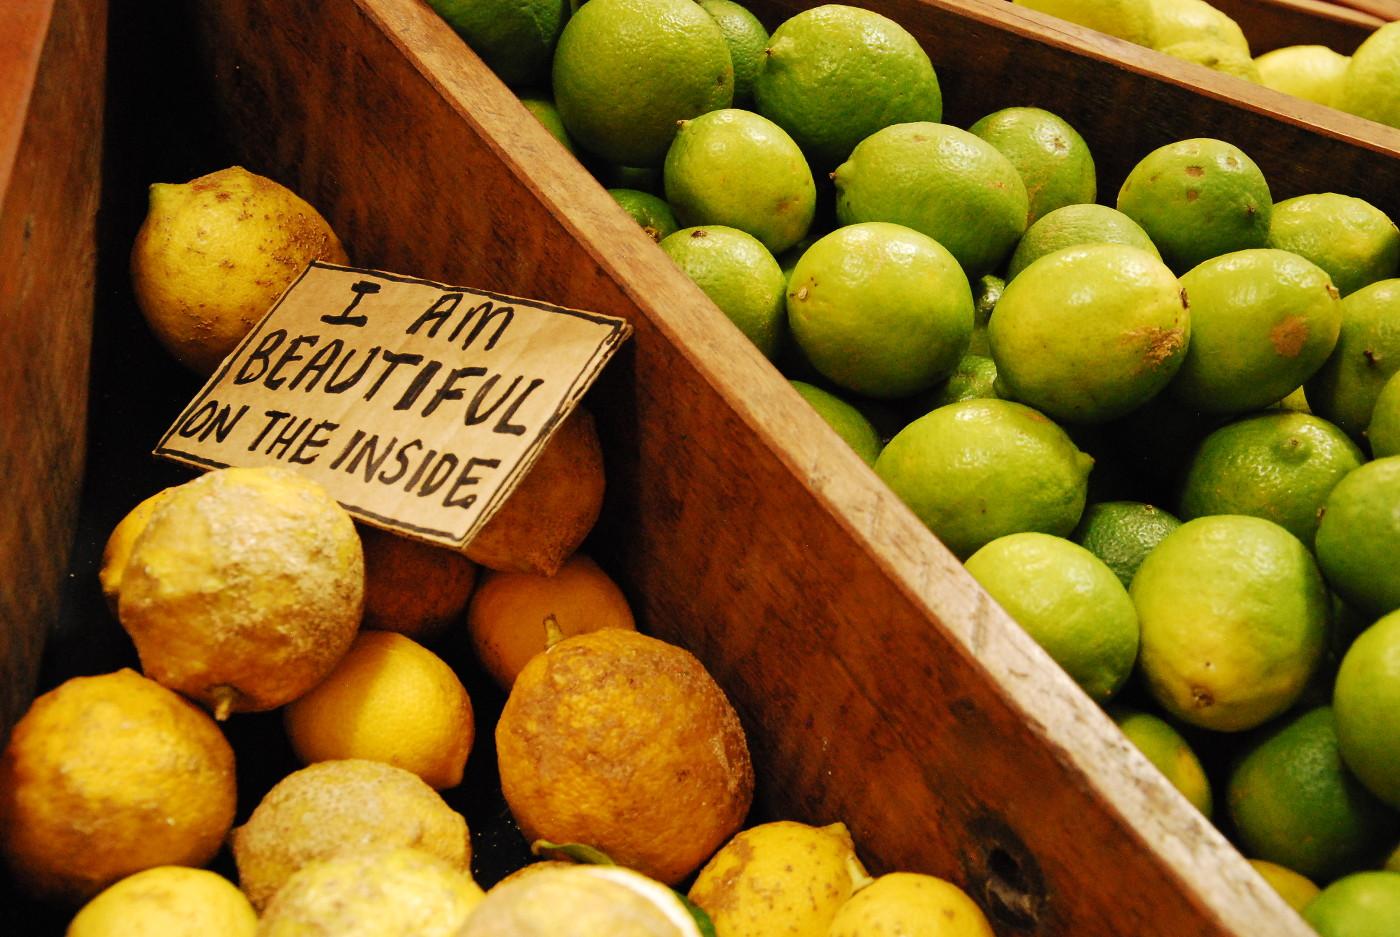 Santos Organics fruits